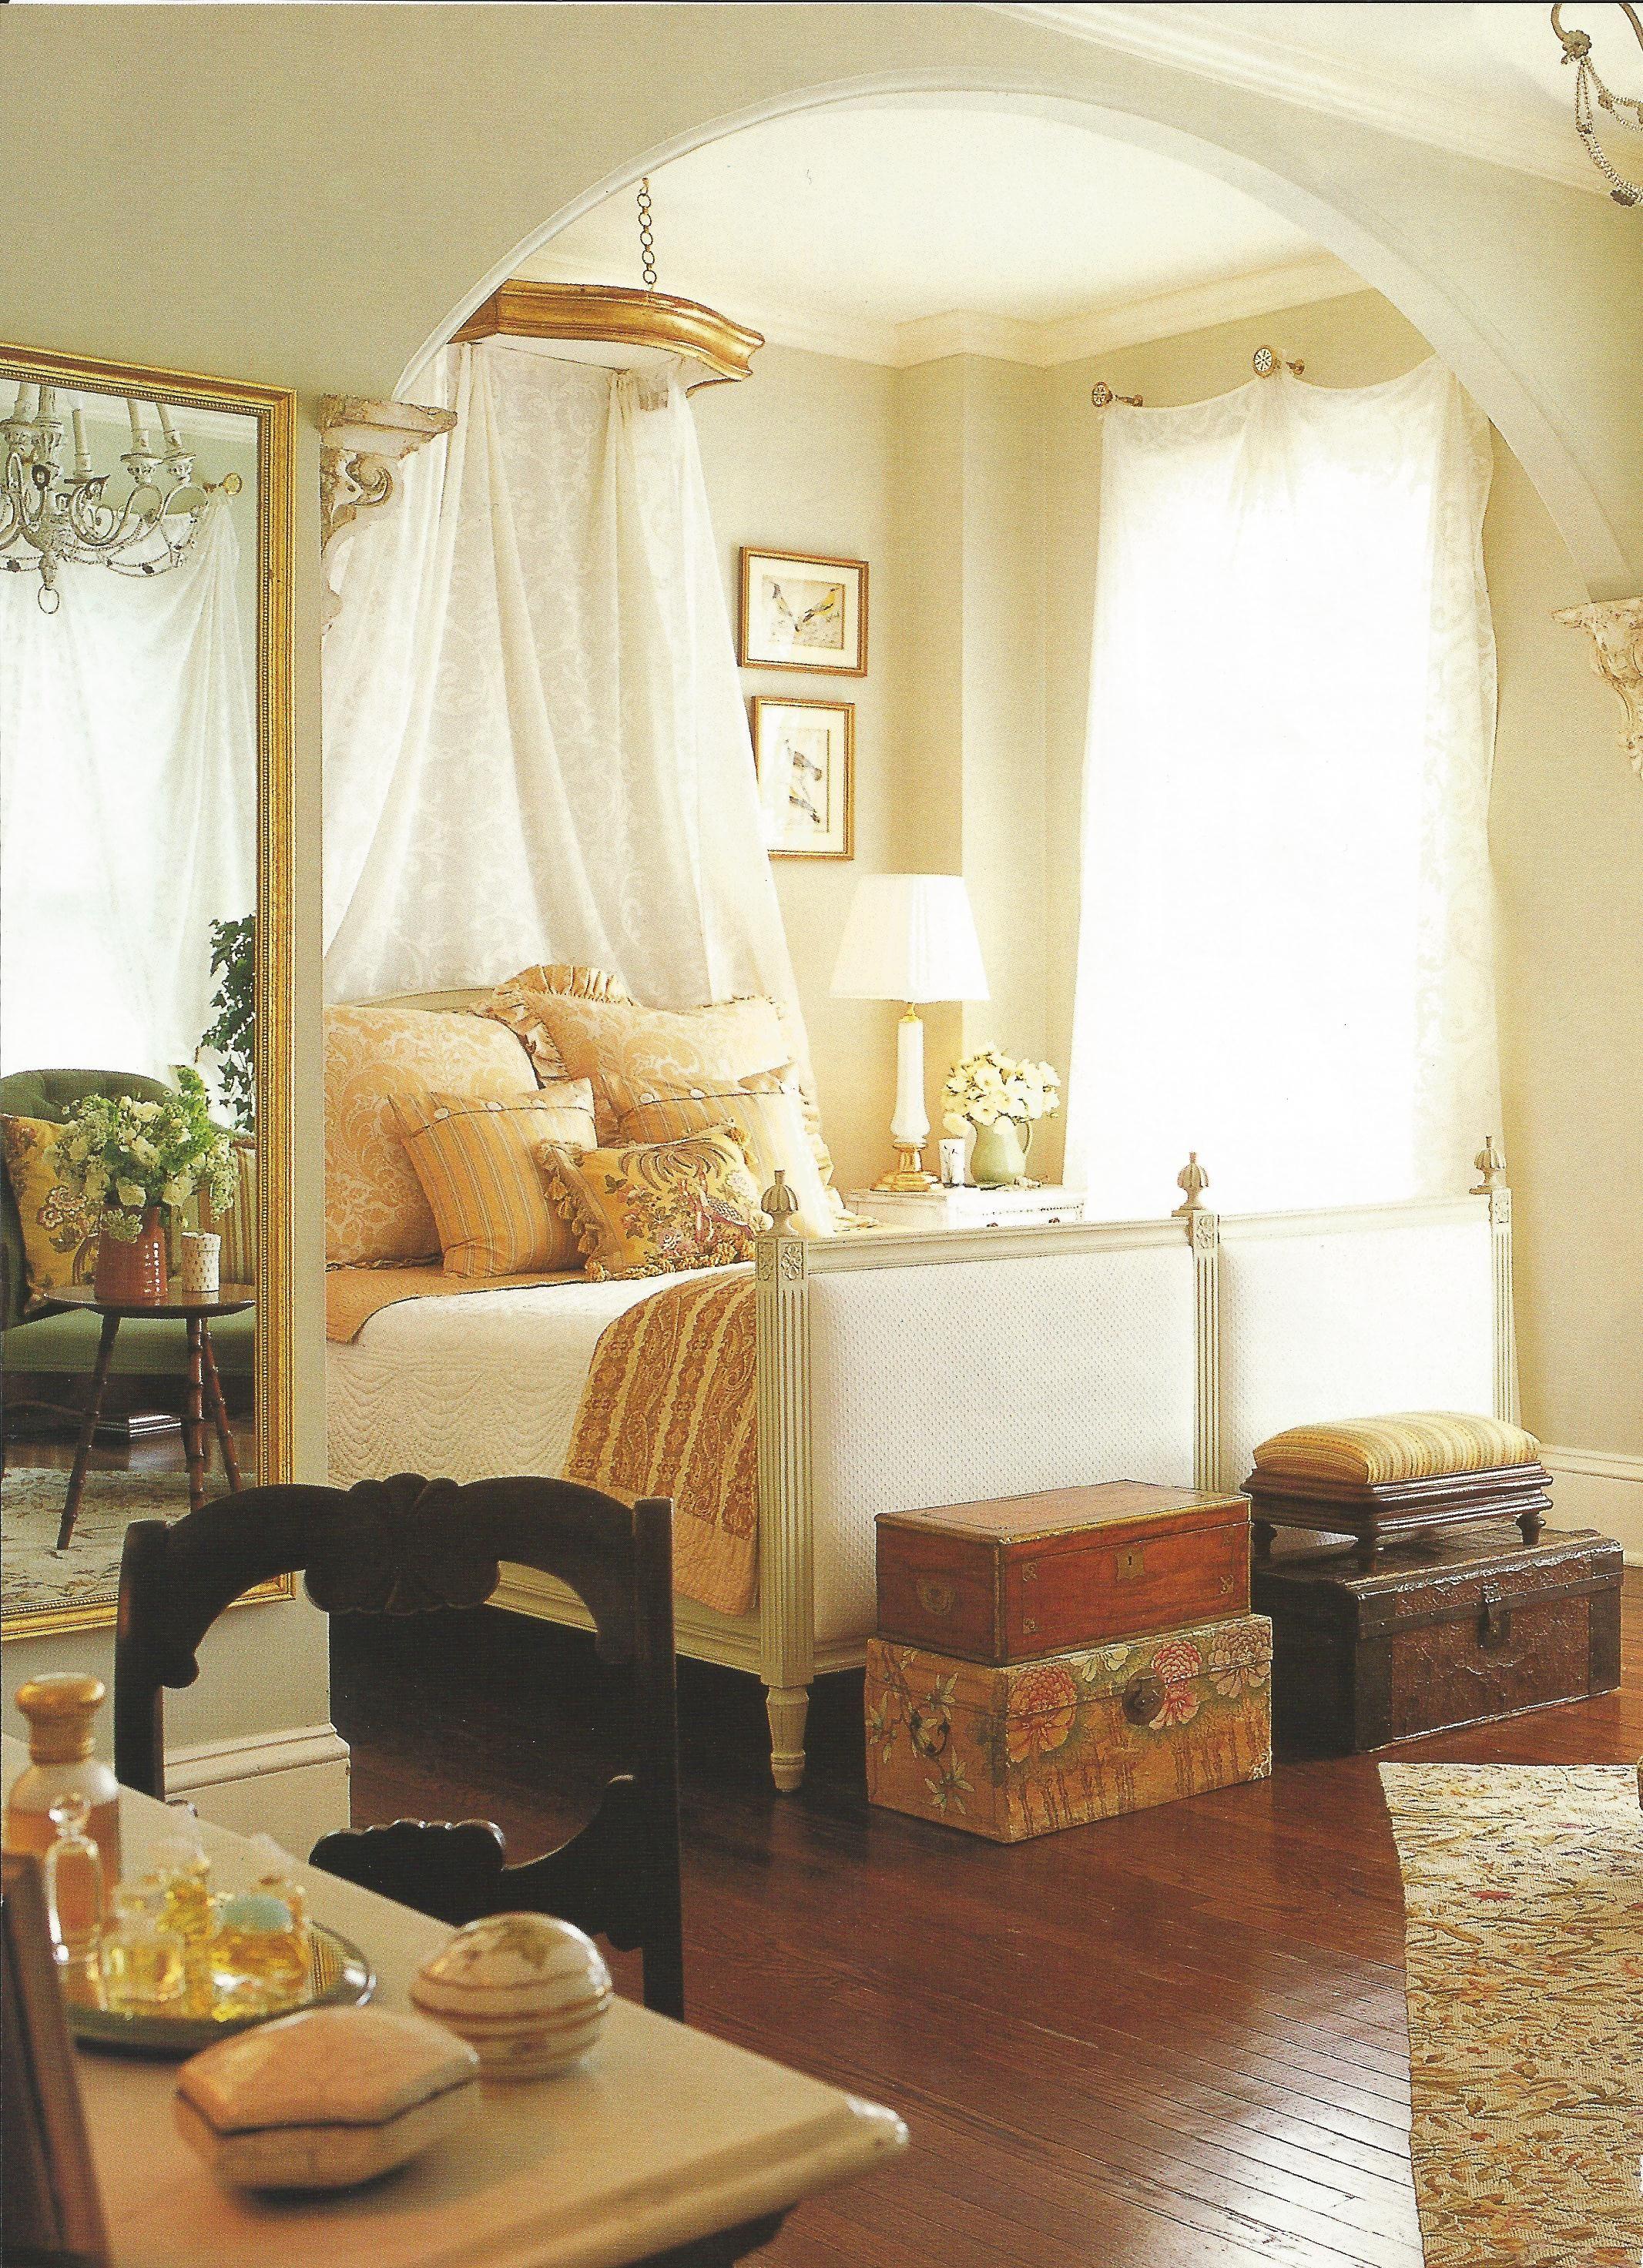 Romantisches schlafzimmer interieur softness  bedrooms  pinterest